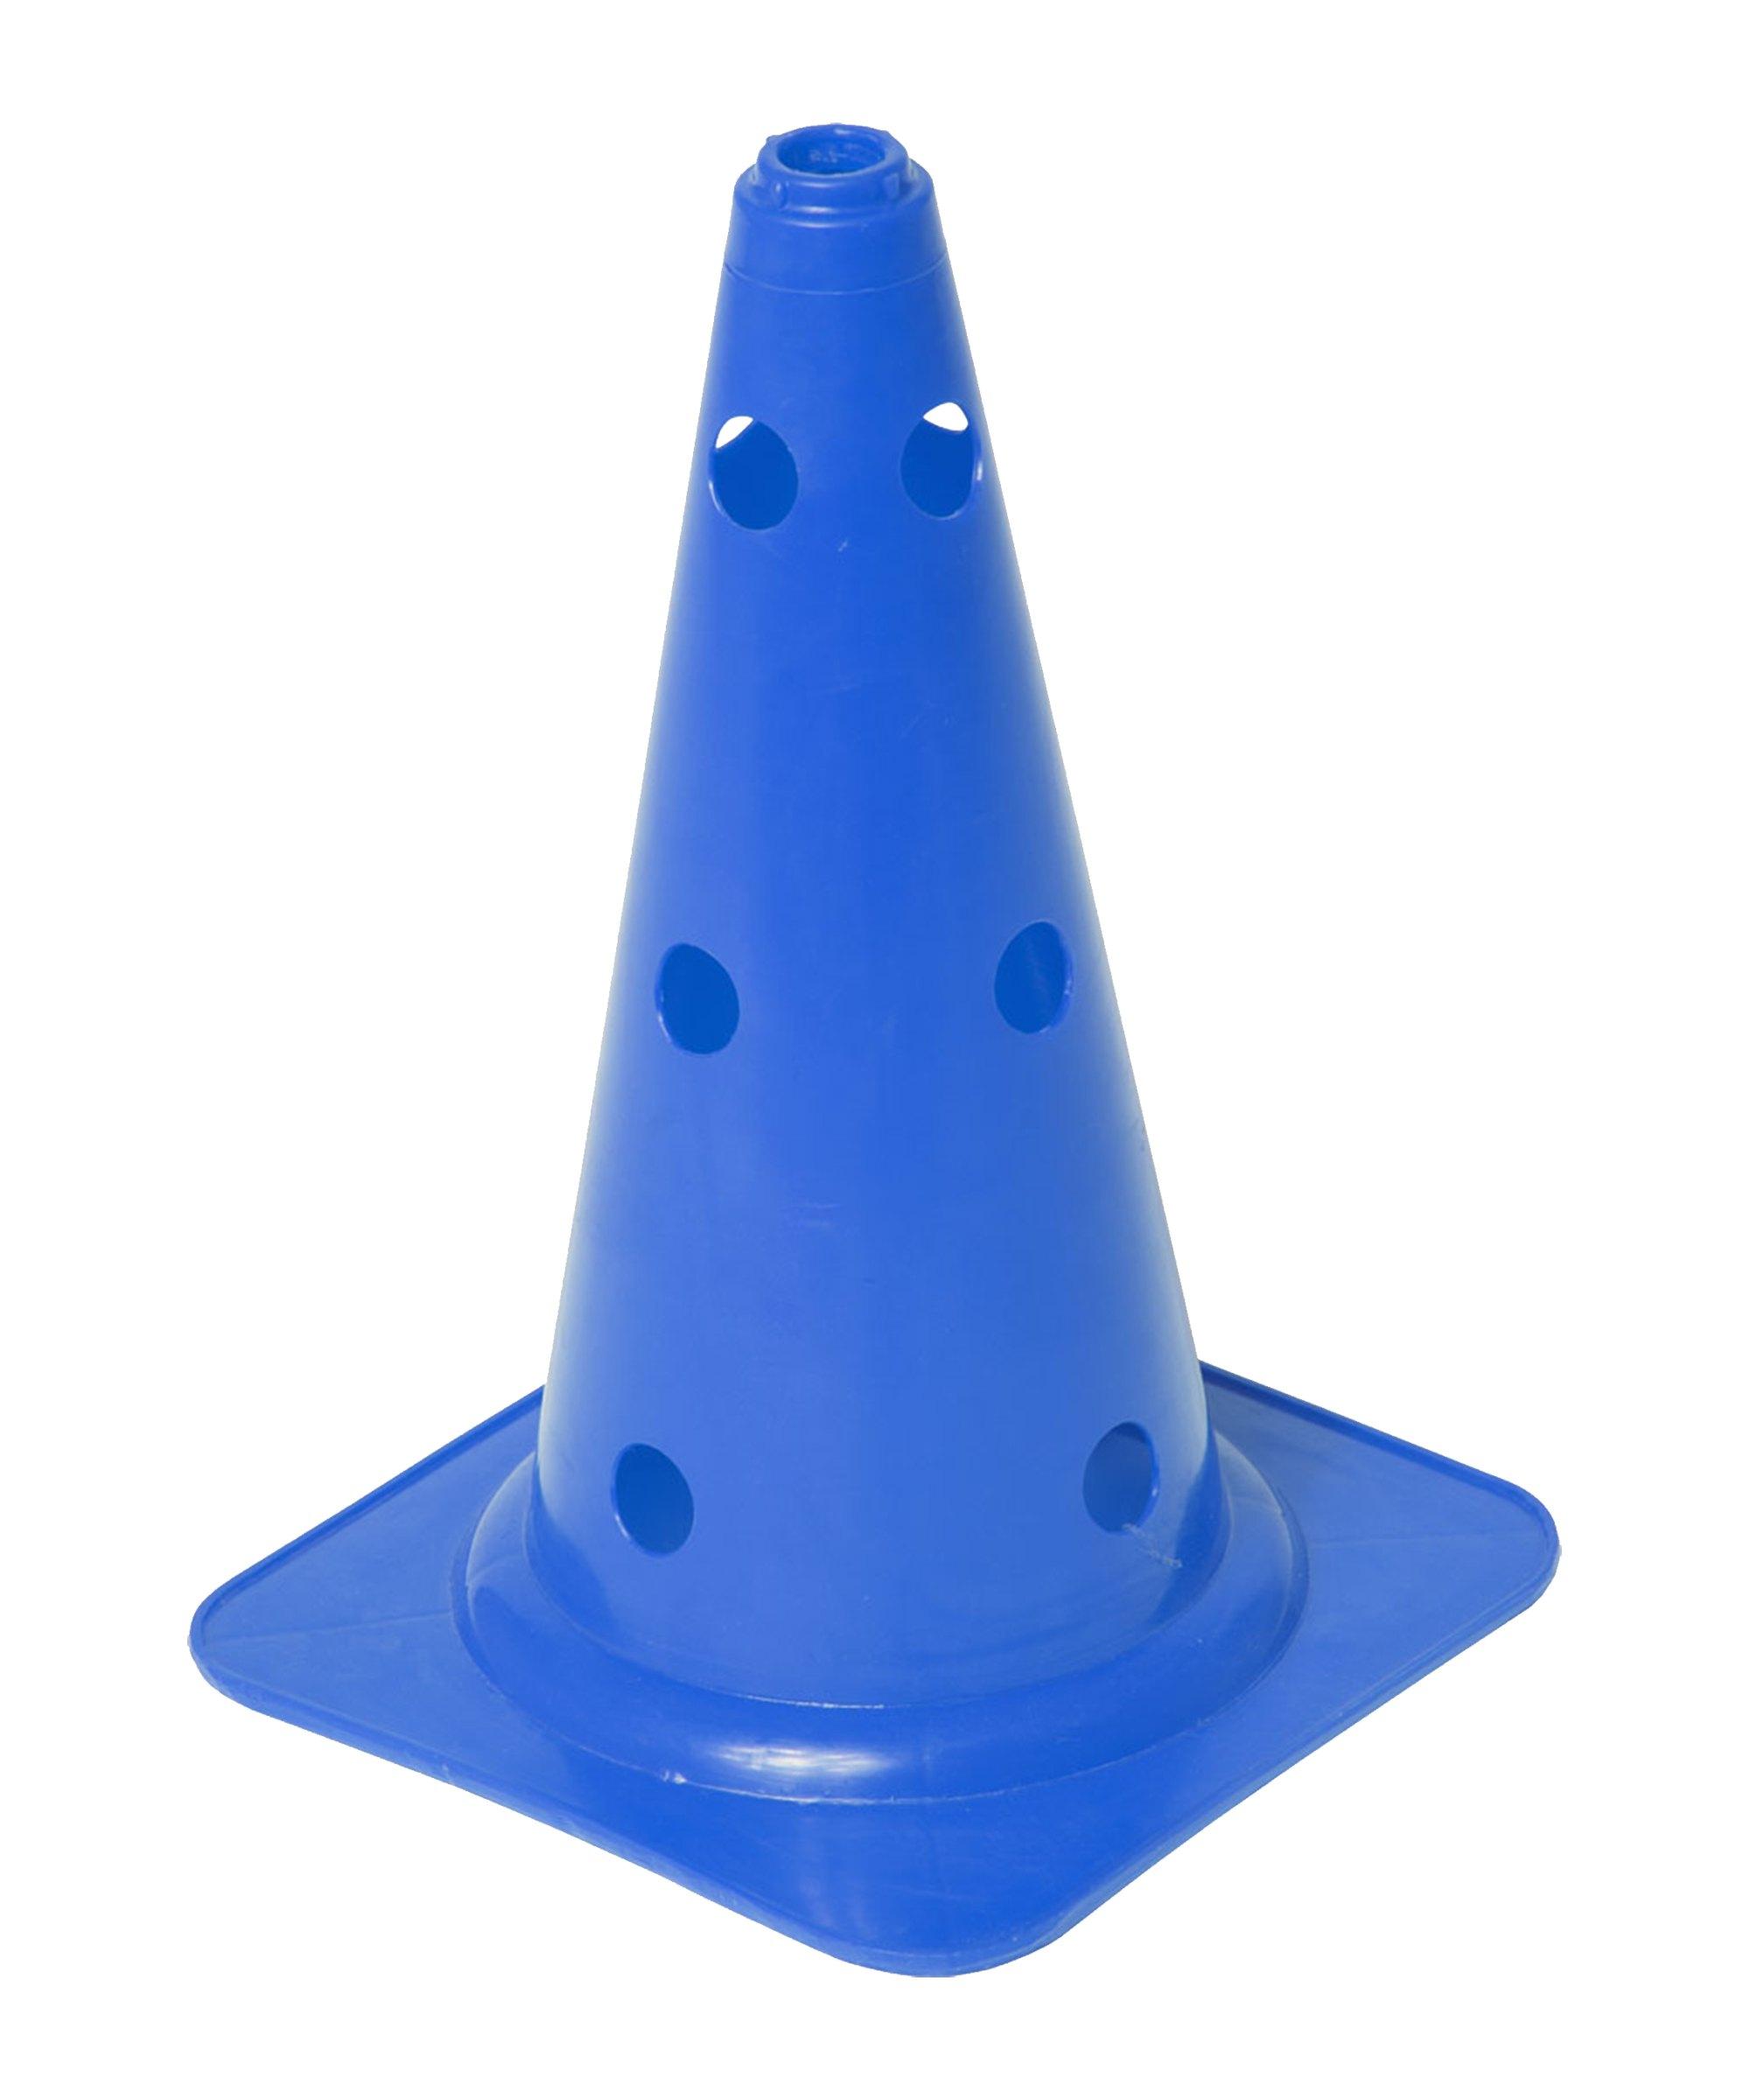 Cawila Multifunktionskegel L 40cm Blau - blau